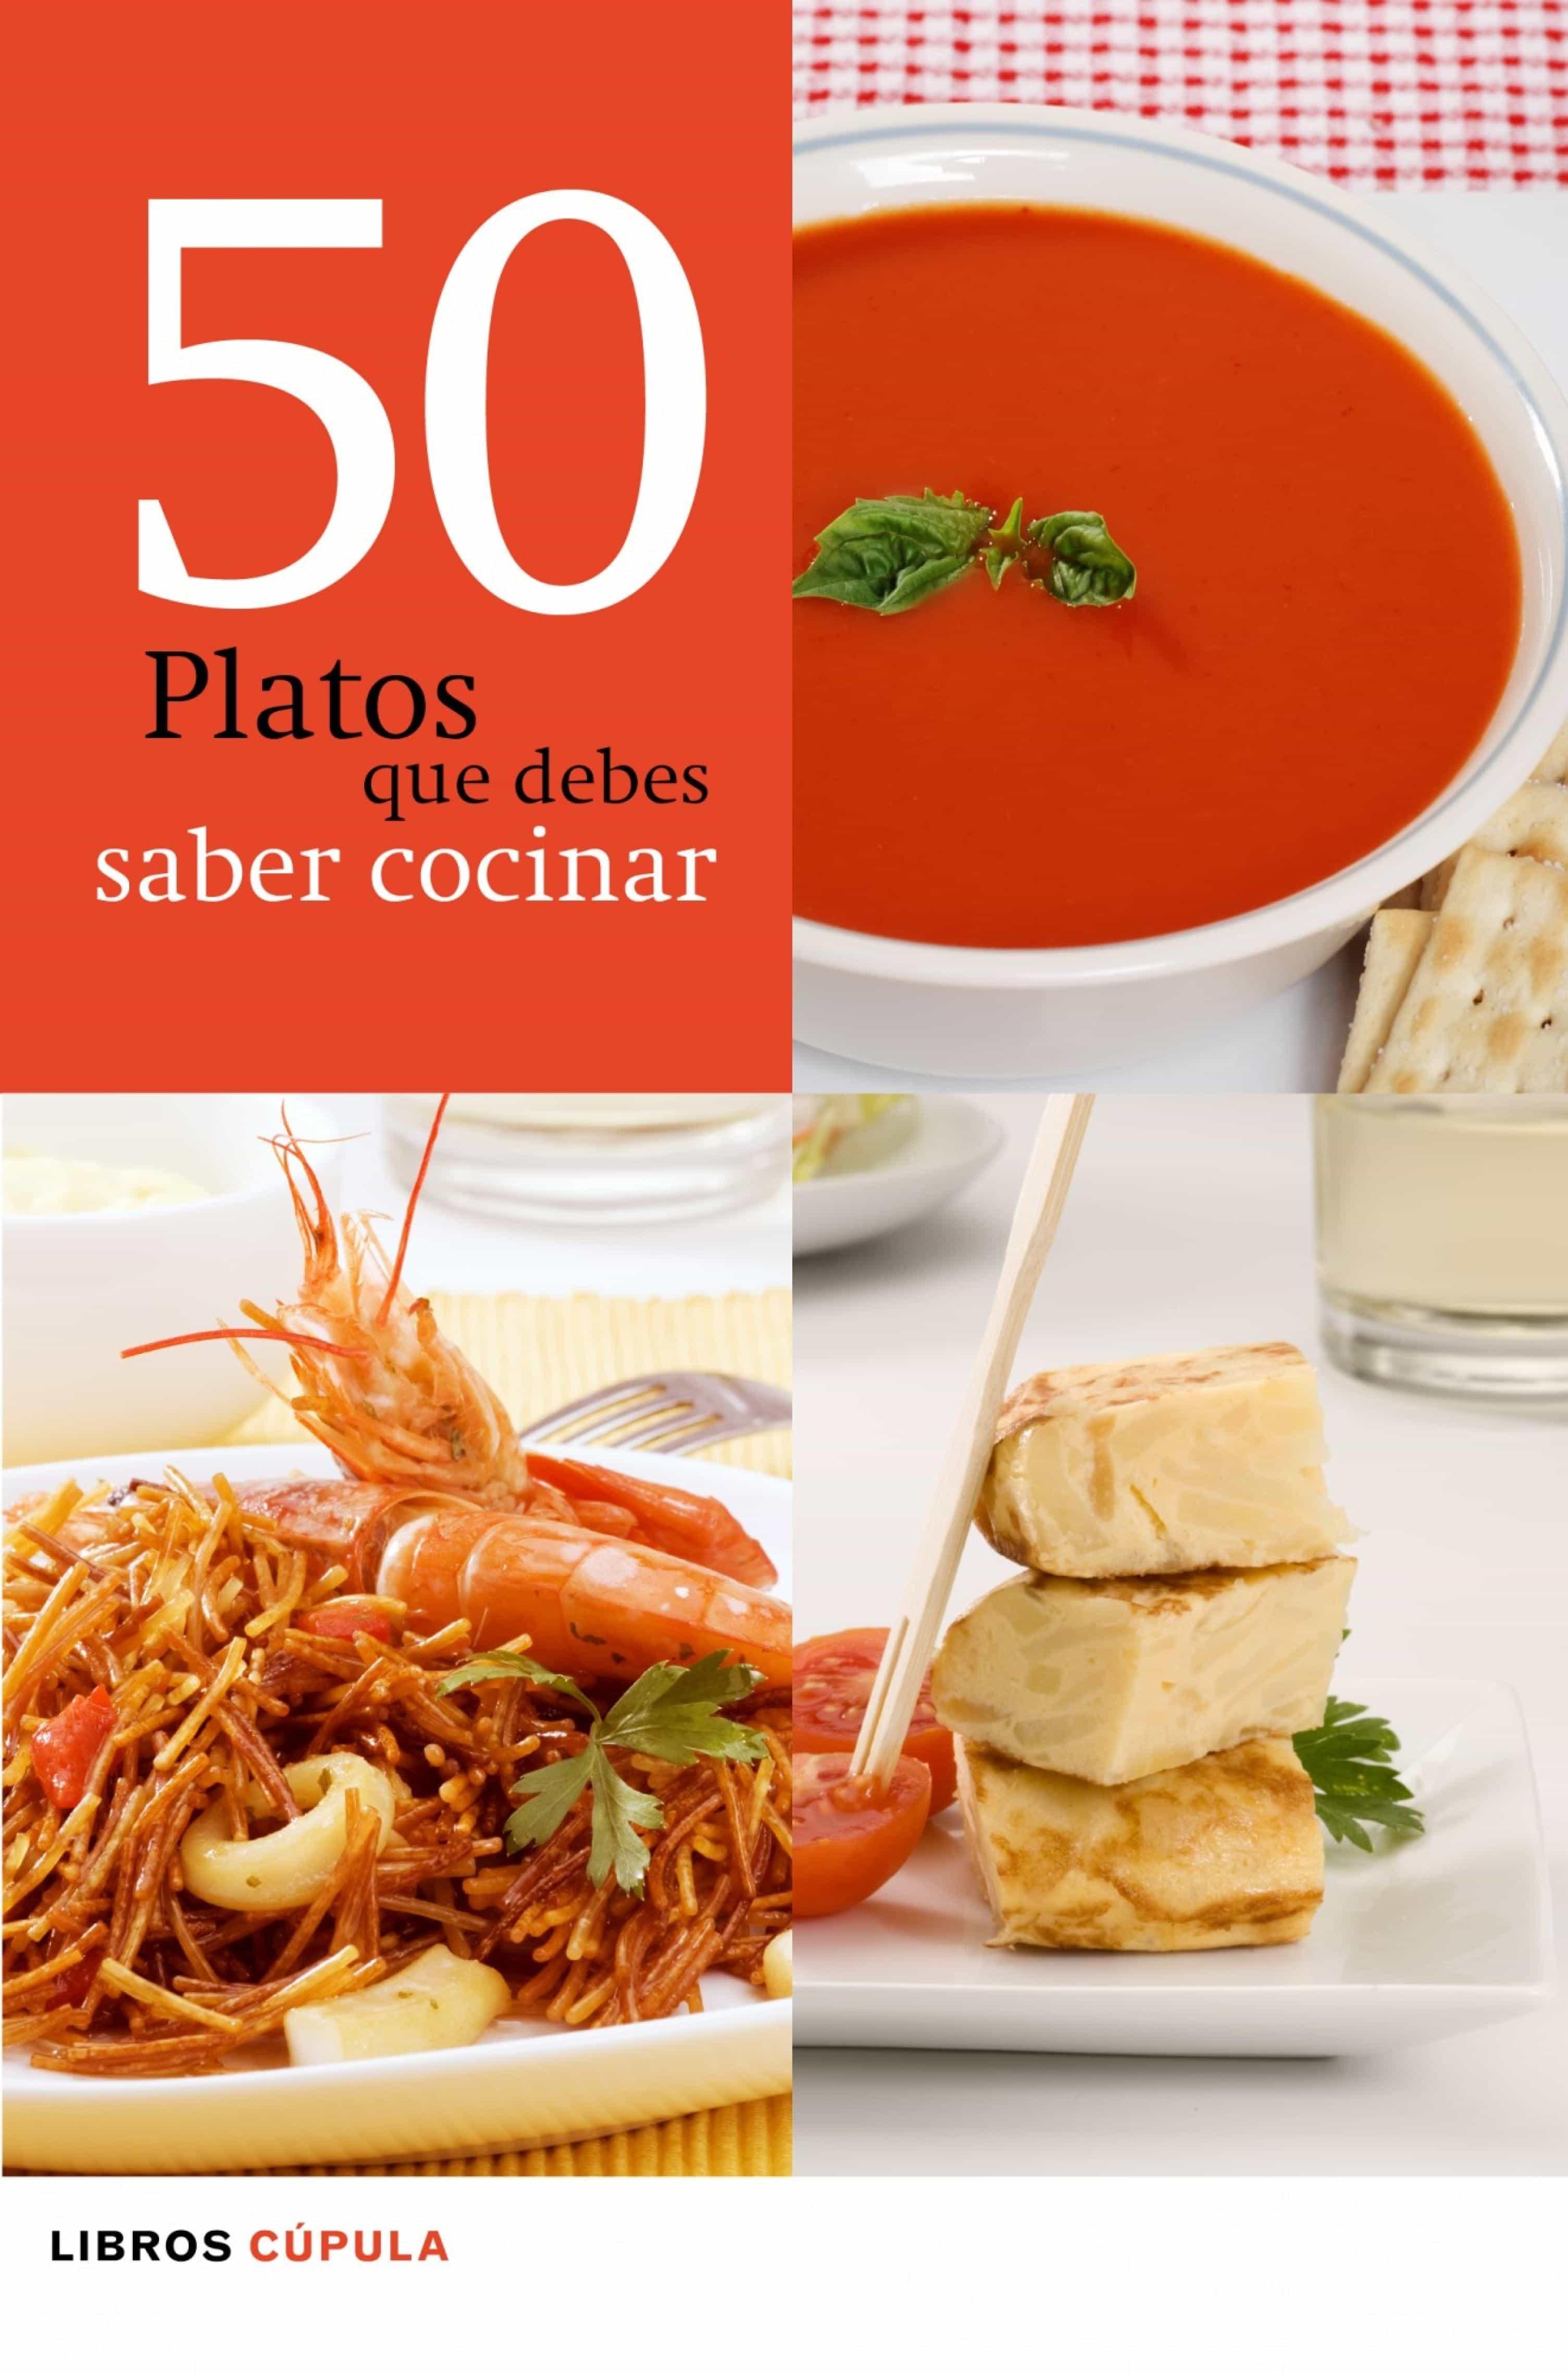 Charming 50 Platos Que Debes Saber Cocinar (ebook) 9788448069674